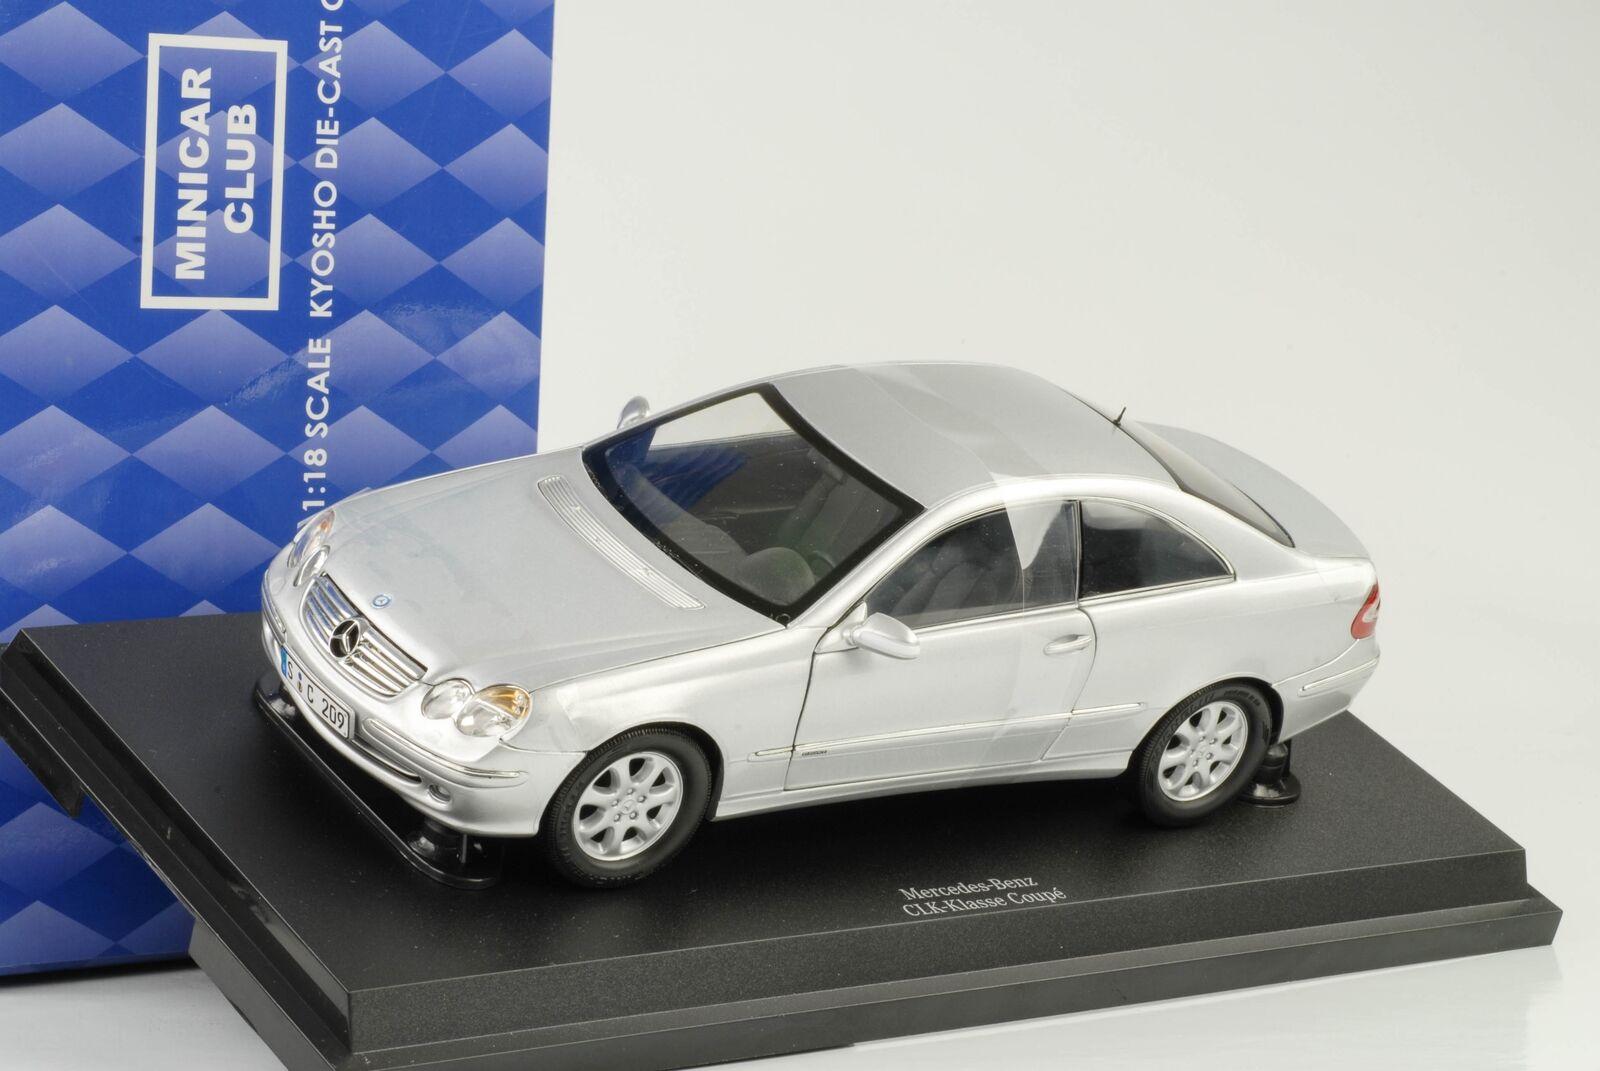 2009 Mercedes-Benz CLK c209 Coupe argent 1 18 Kyosho QUALITE